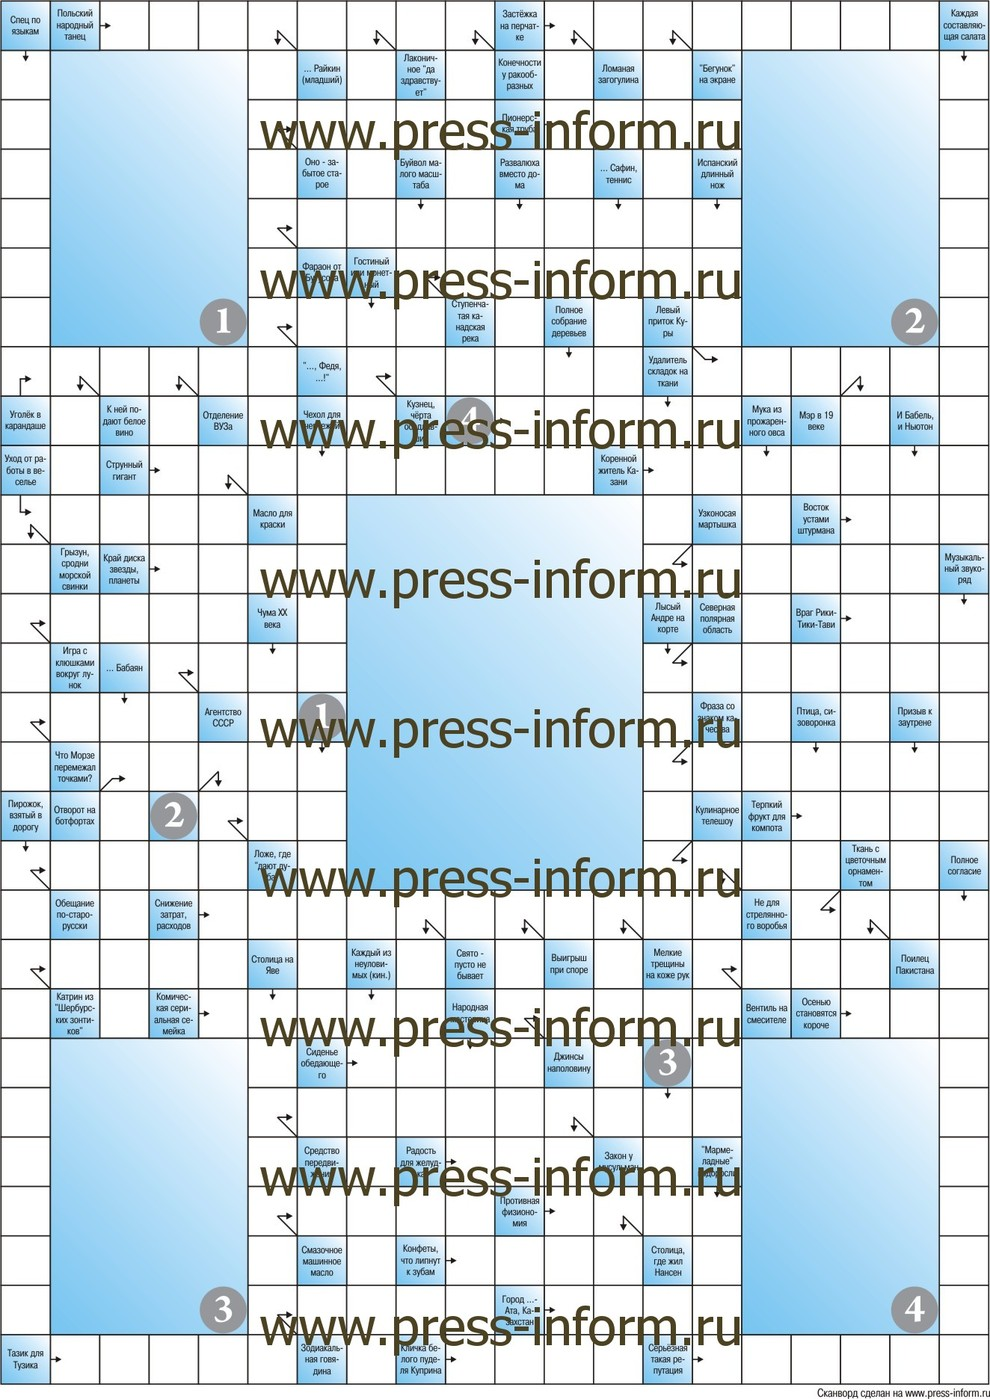 Сканворд В3  kx клеток, 4 картинки 4x5, пустой блок 6x8